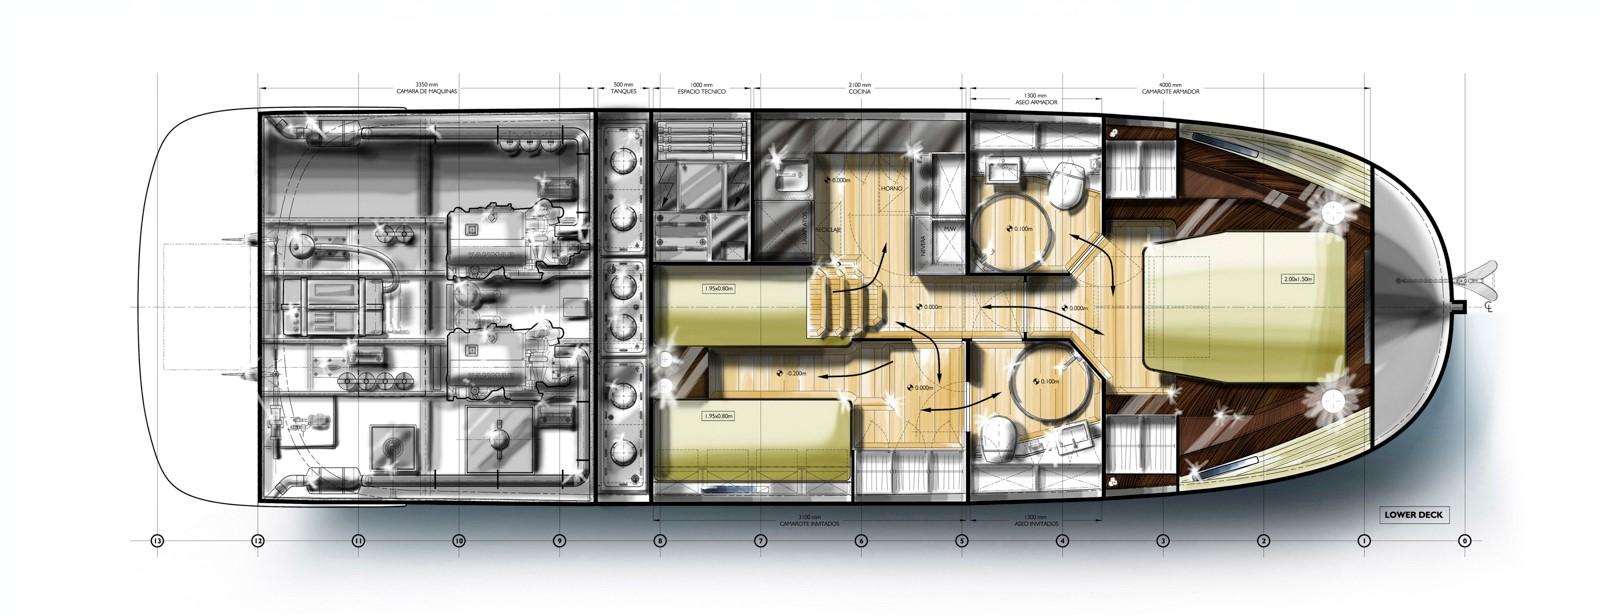 minorca islander 42 hardtop lower layout